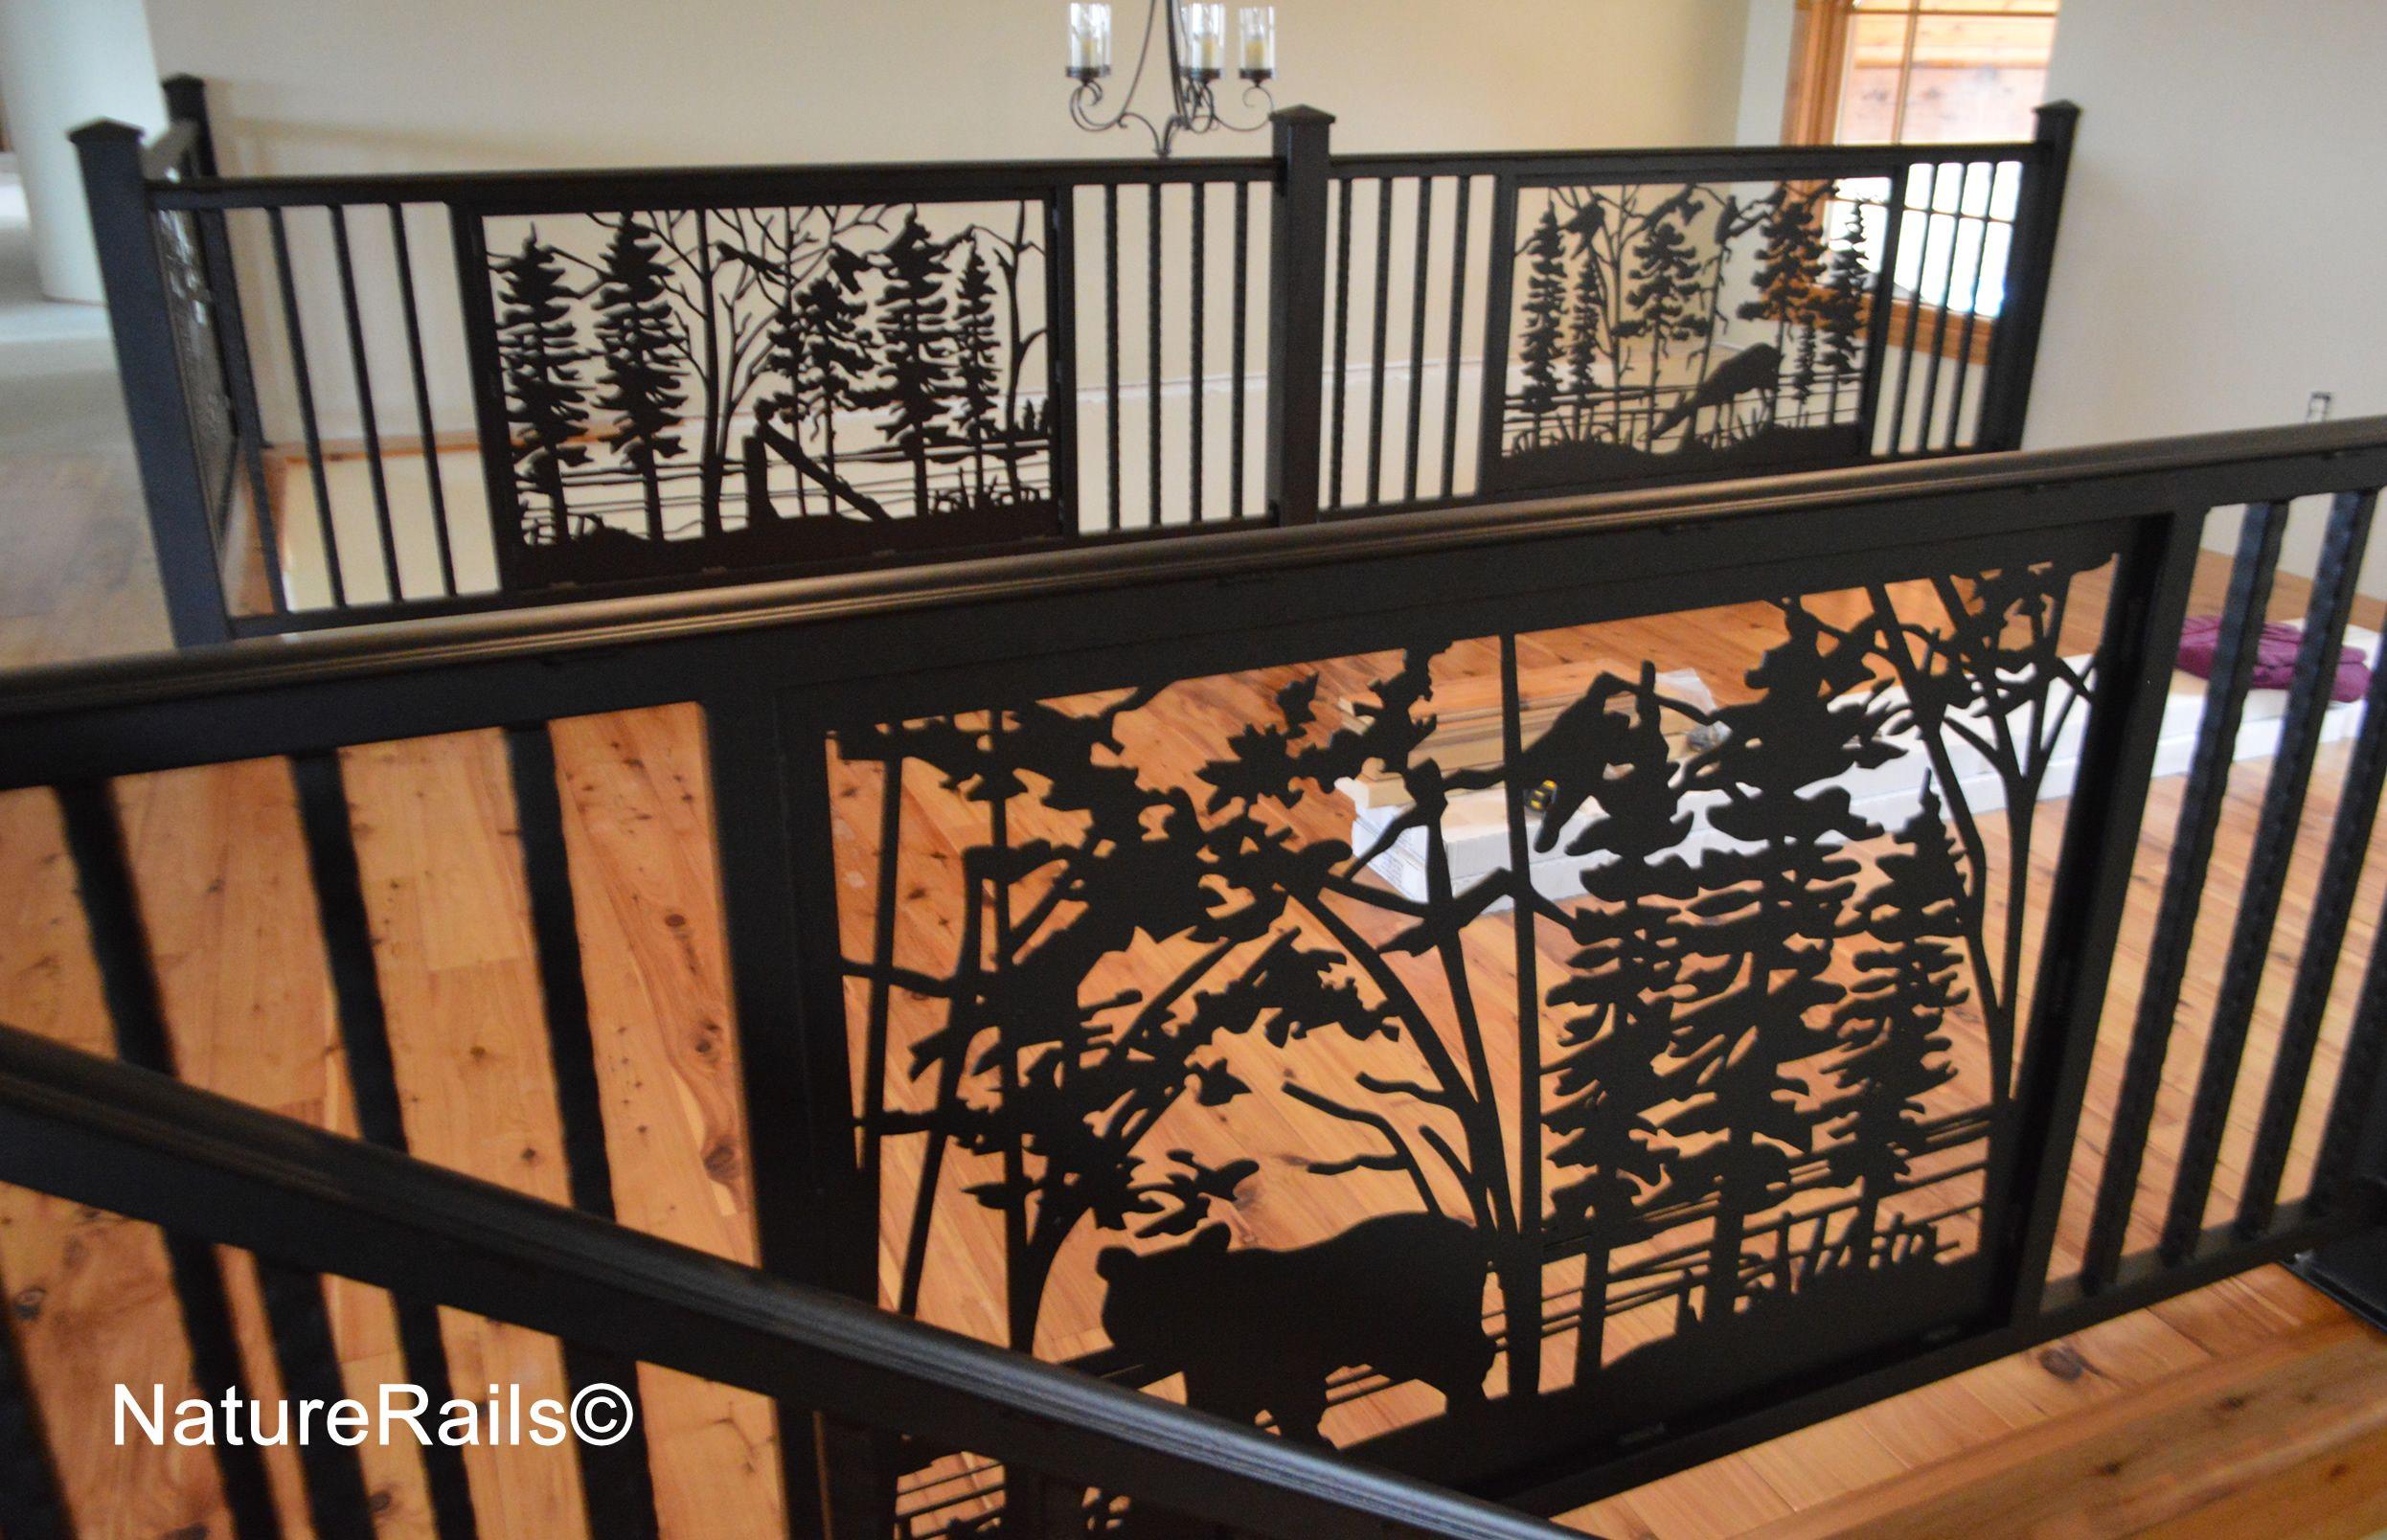 Deck Loft Balcony Railing Naturerails Com Railing Lattice   Menards Wrought Iron Railing   Handrail   Deck Railing   Spindles   Fence   Cattail